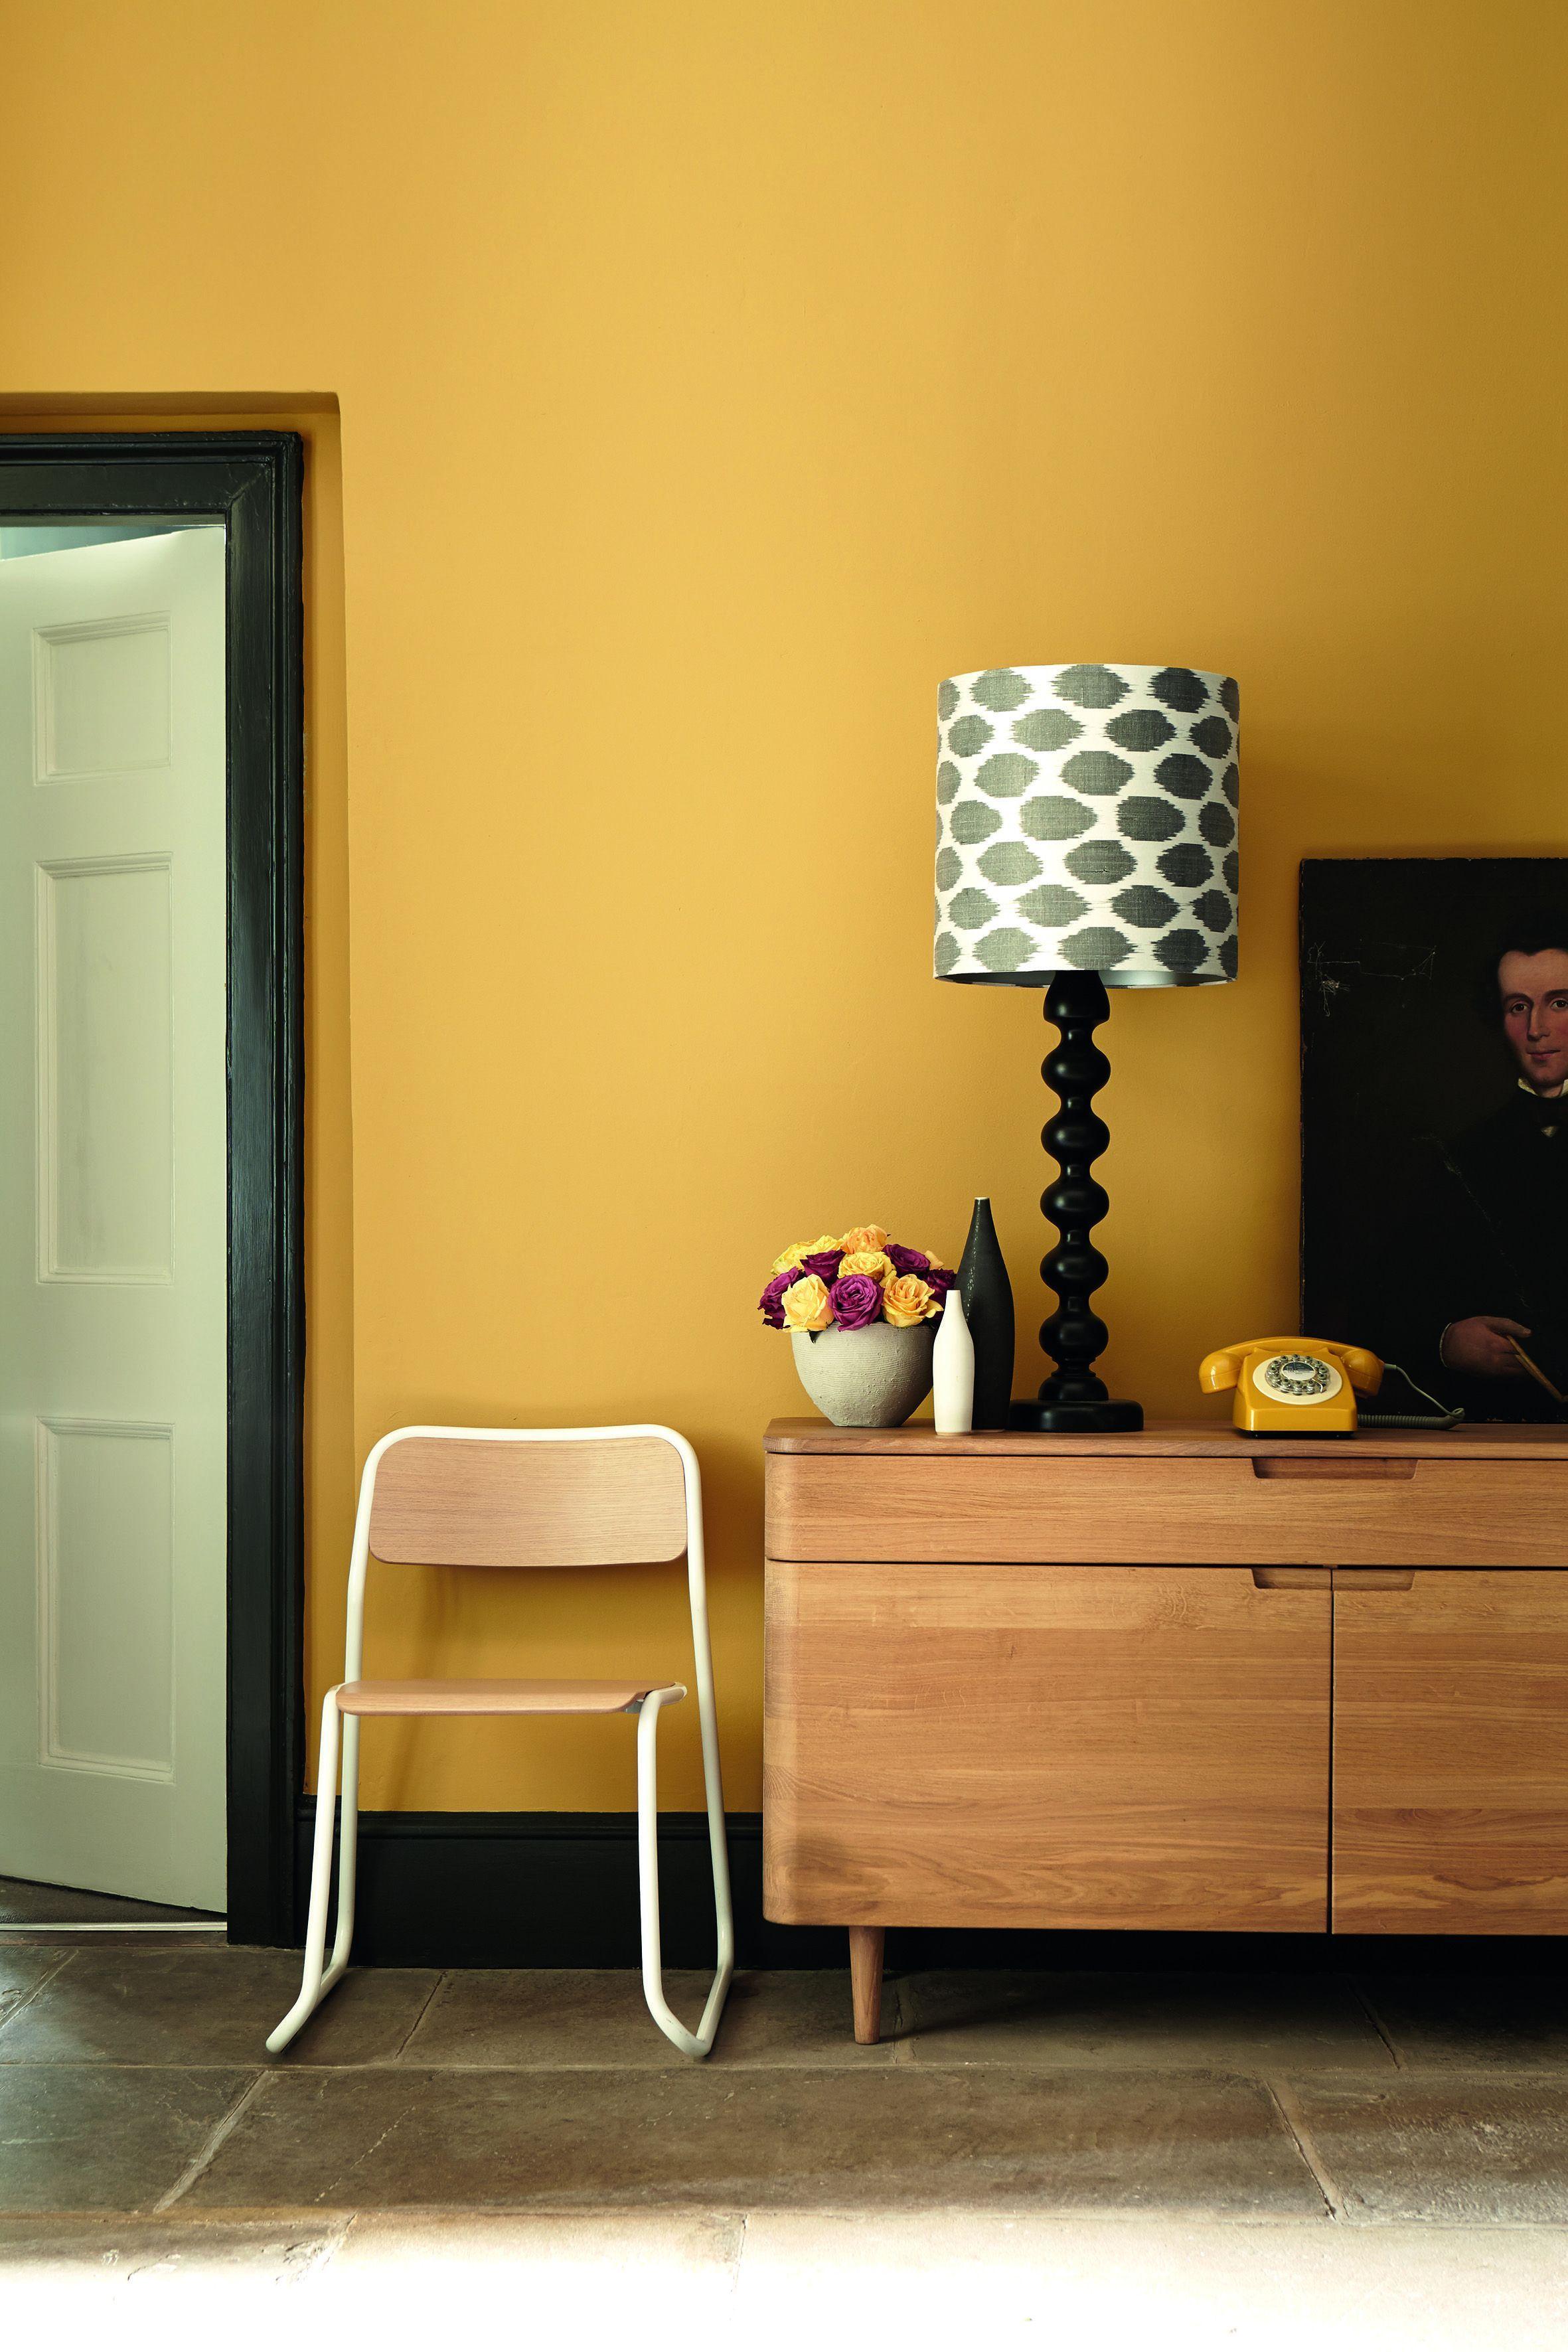 MUSTARD YELLOW IN INTERIOR DESIGN | Mustard yellow details in ...